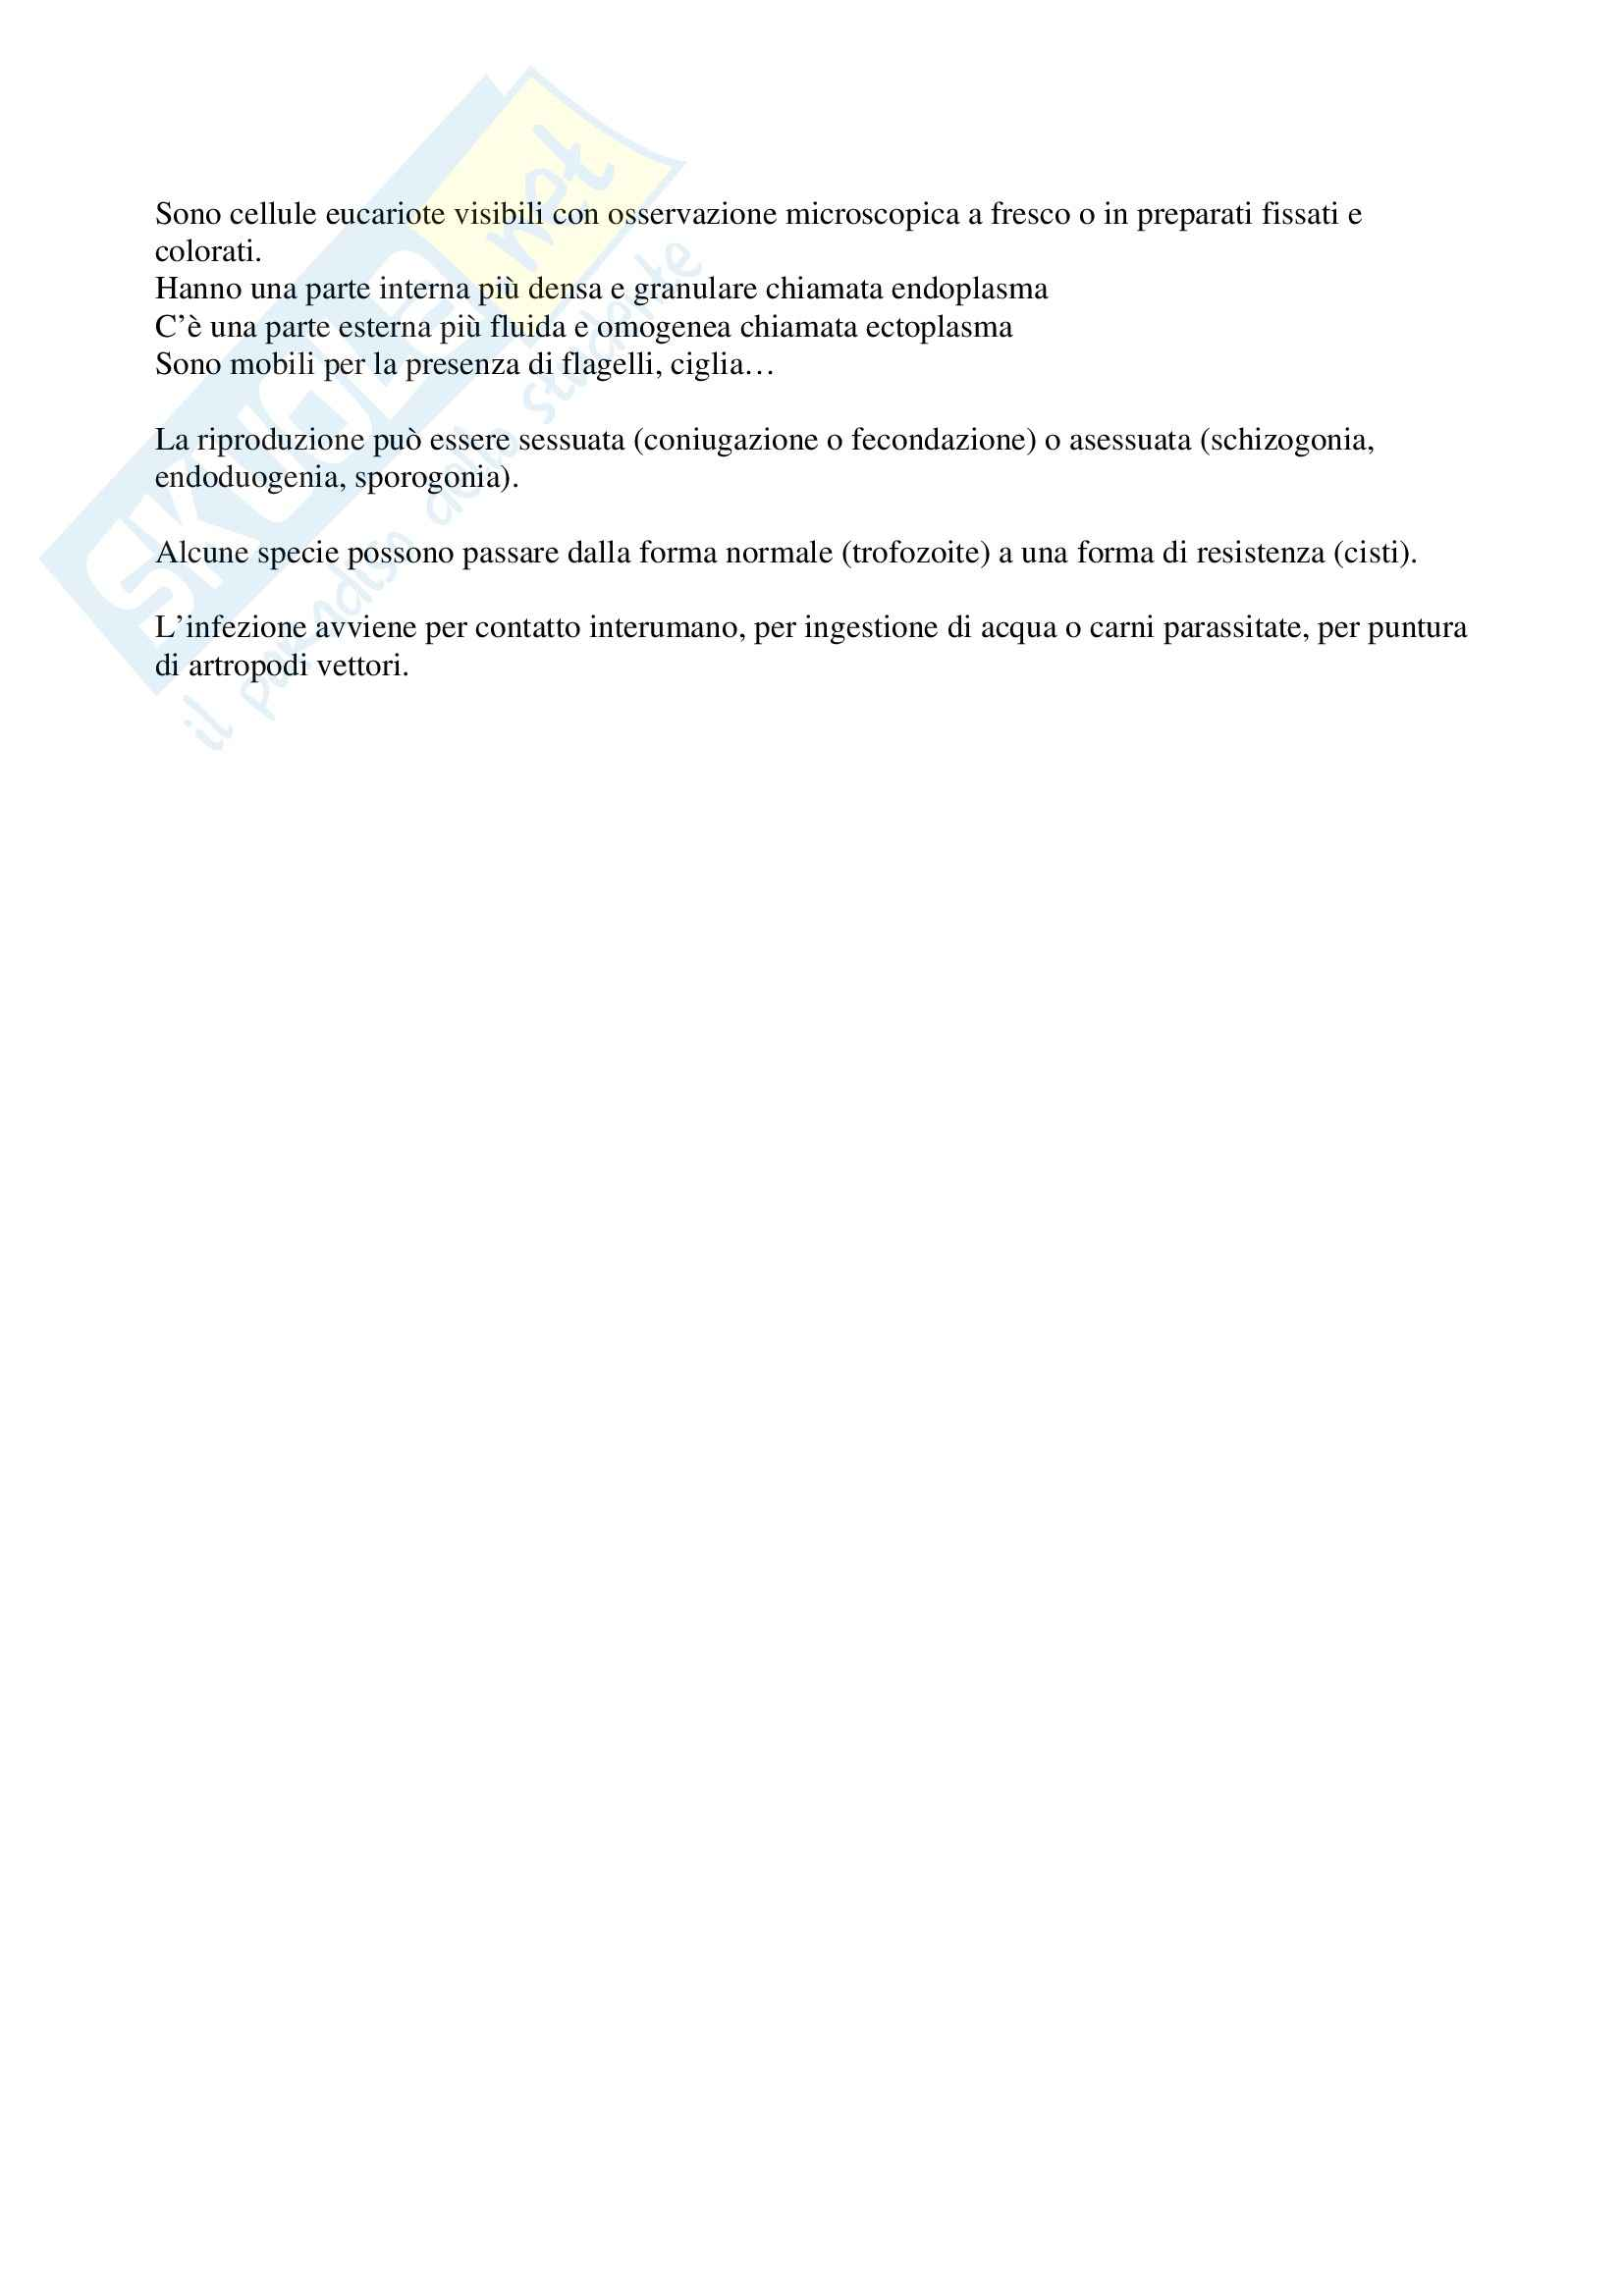 Microbiologia generale e lab. - la protozoologia